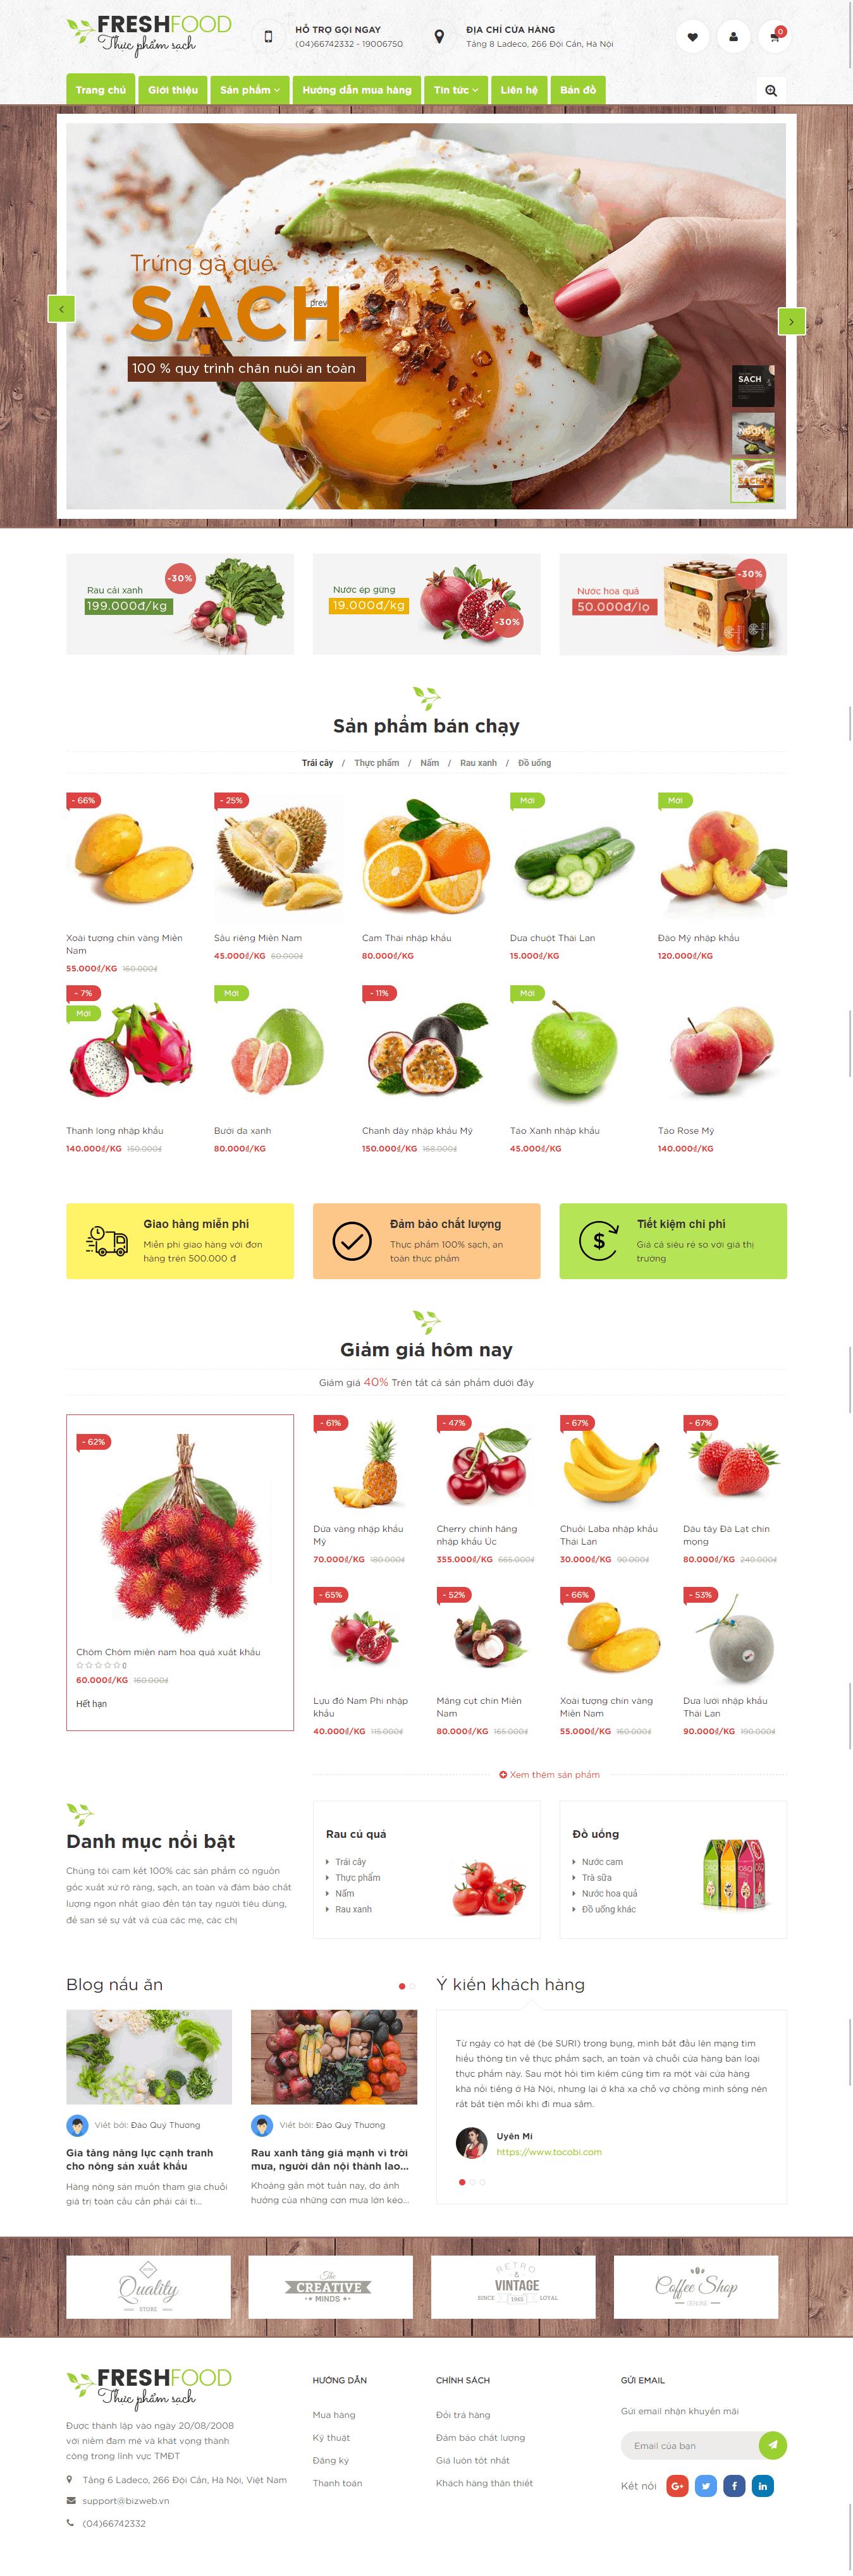 Thiết kế website Thiết kế website shop hoa, quà tặng Fresh Food Thuc pham sach